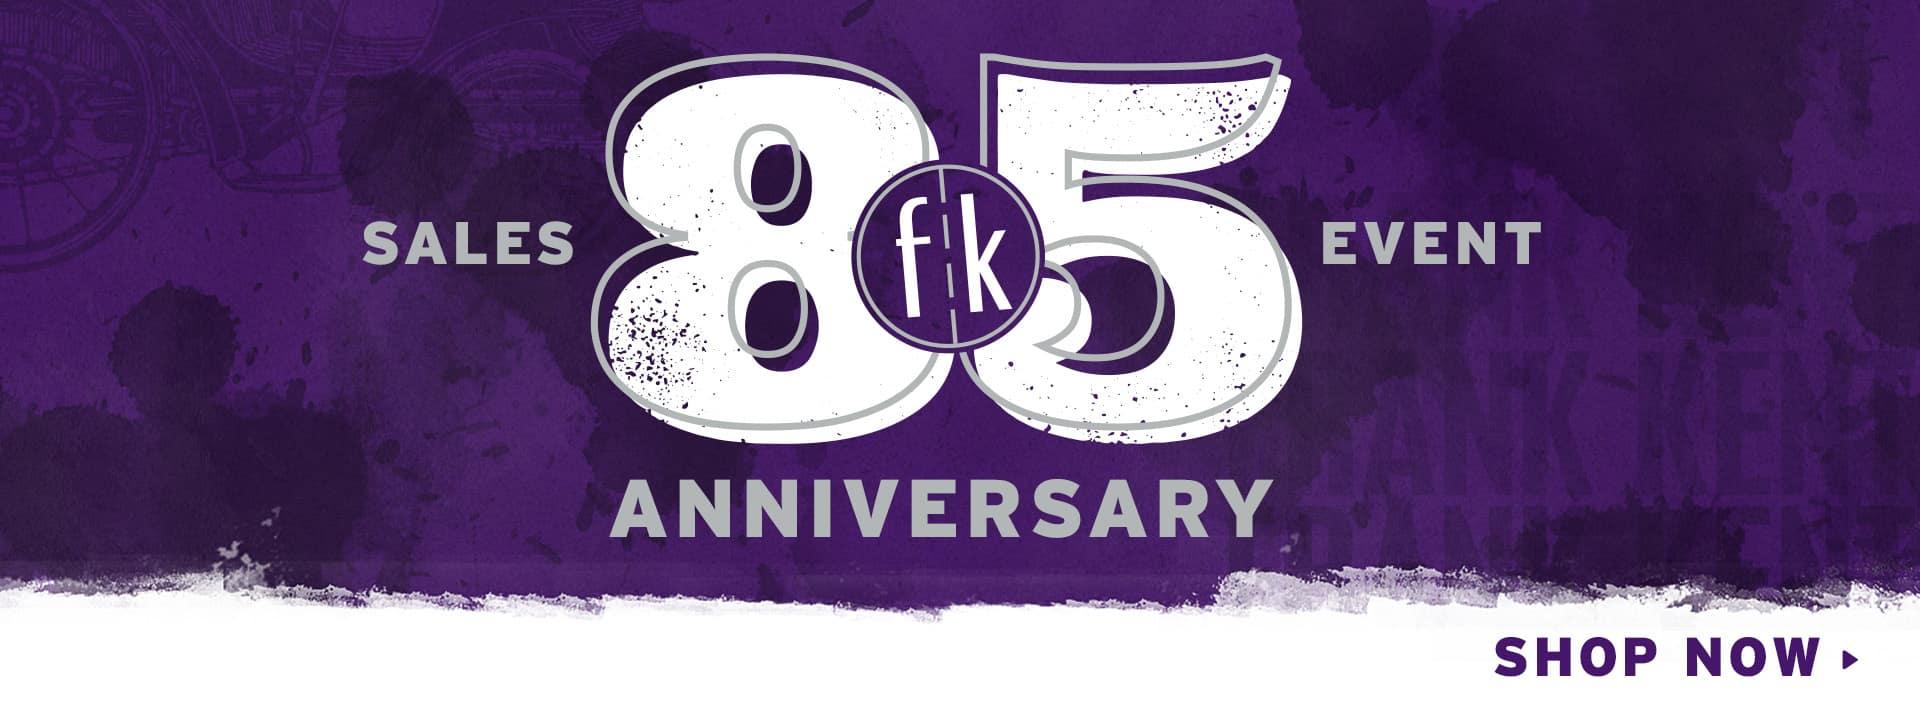 85th Anniversary Sales Event